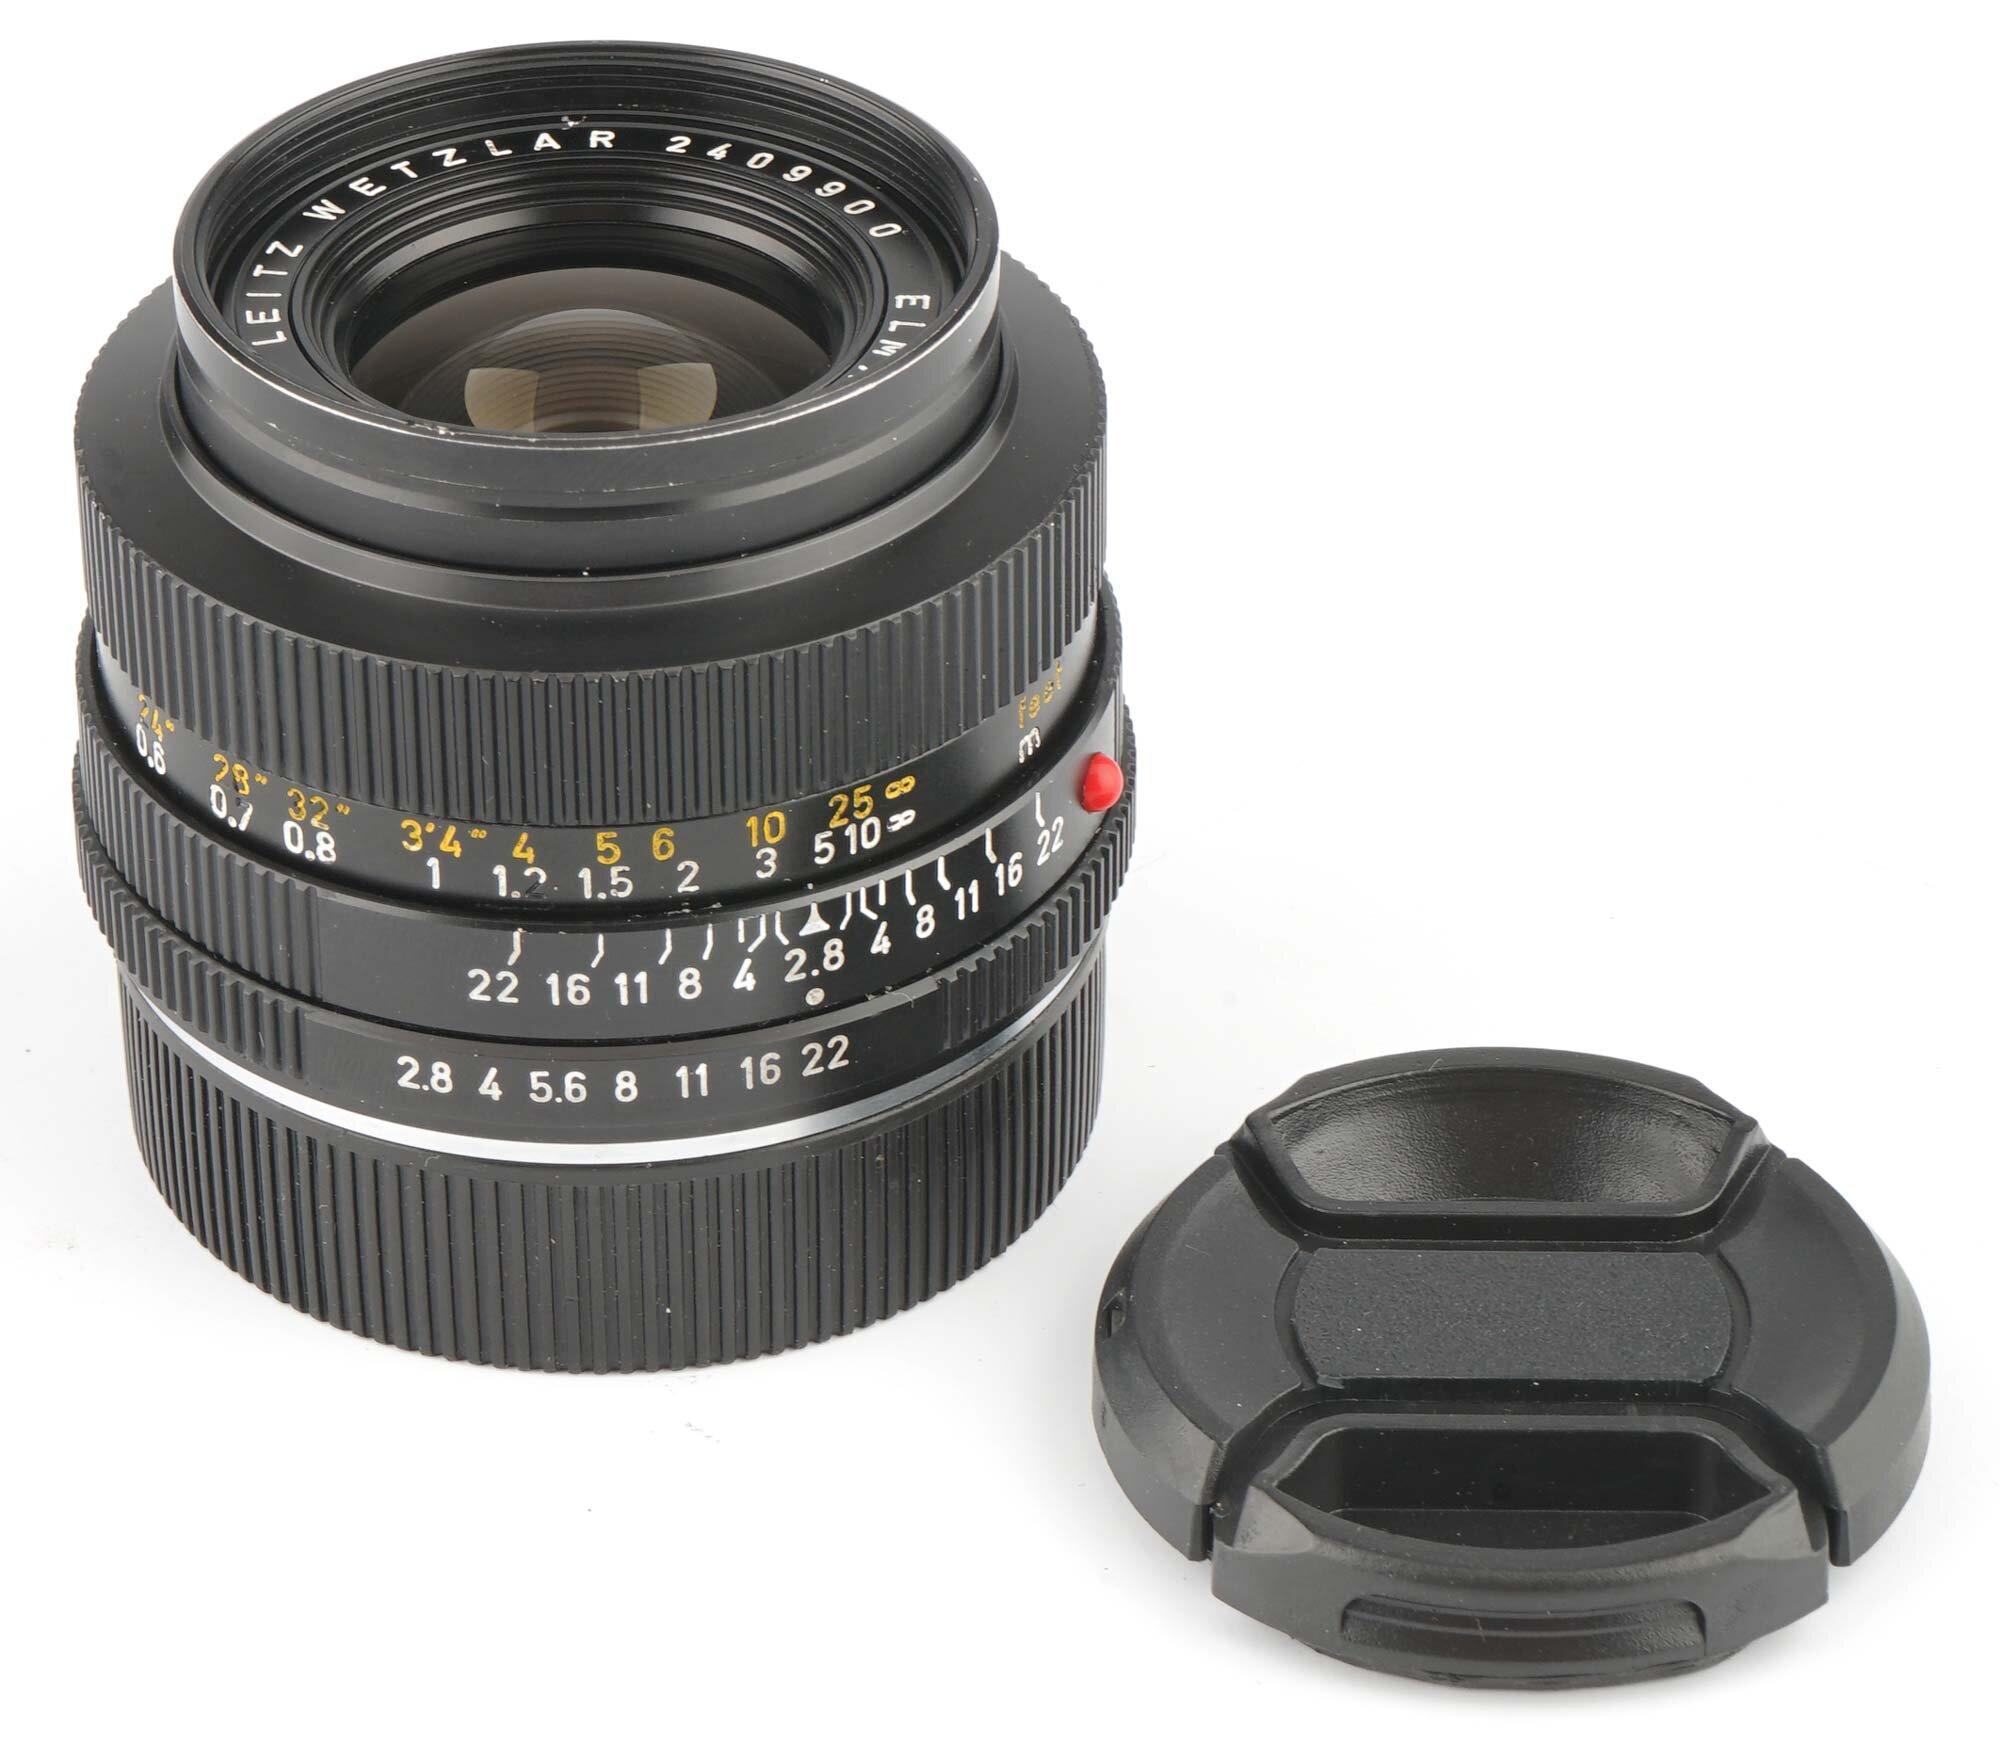 Leica Elmarit-R 2.8/35mm